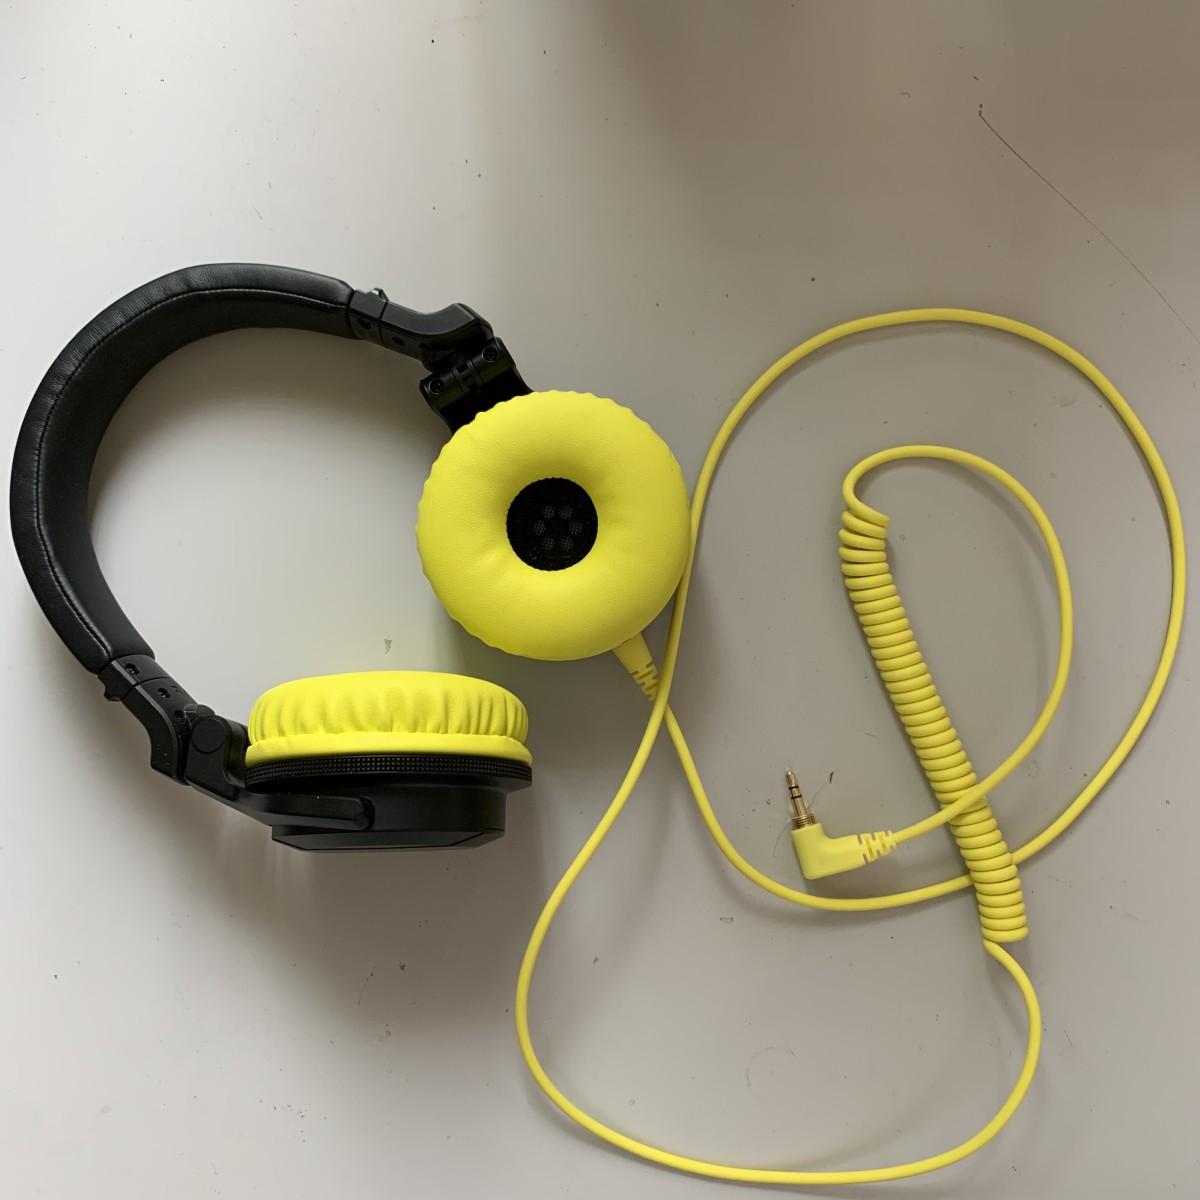 HDJ-CUE1-black-yellow